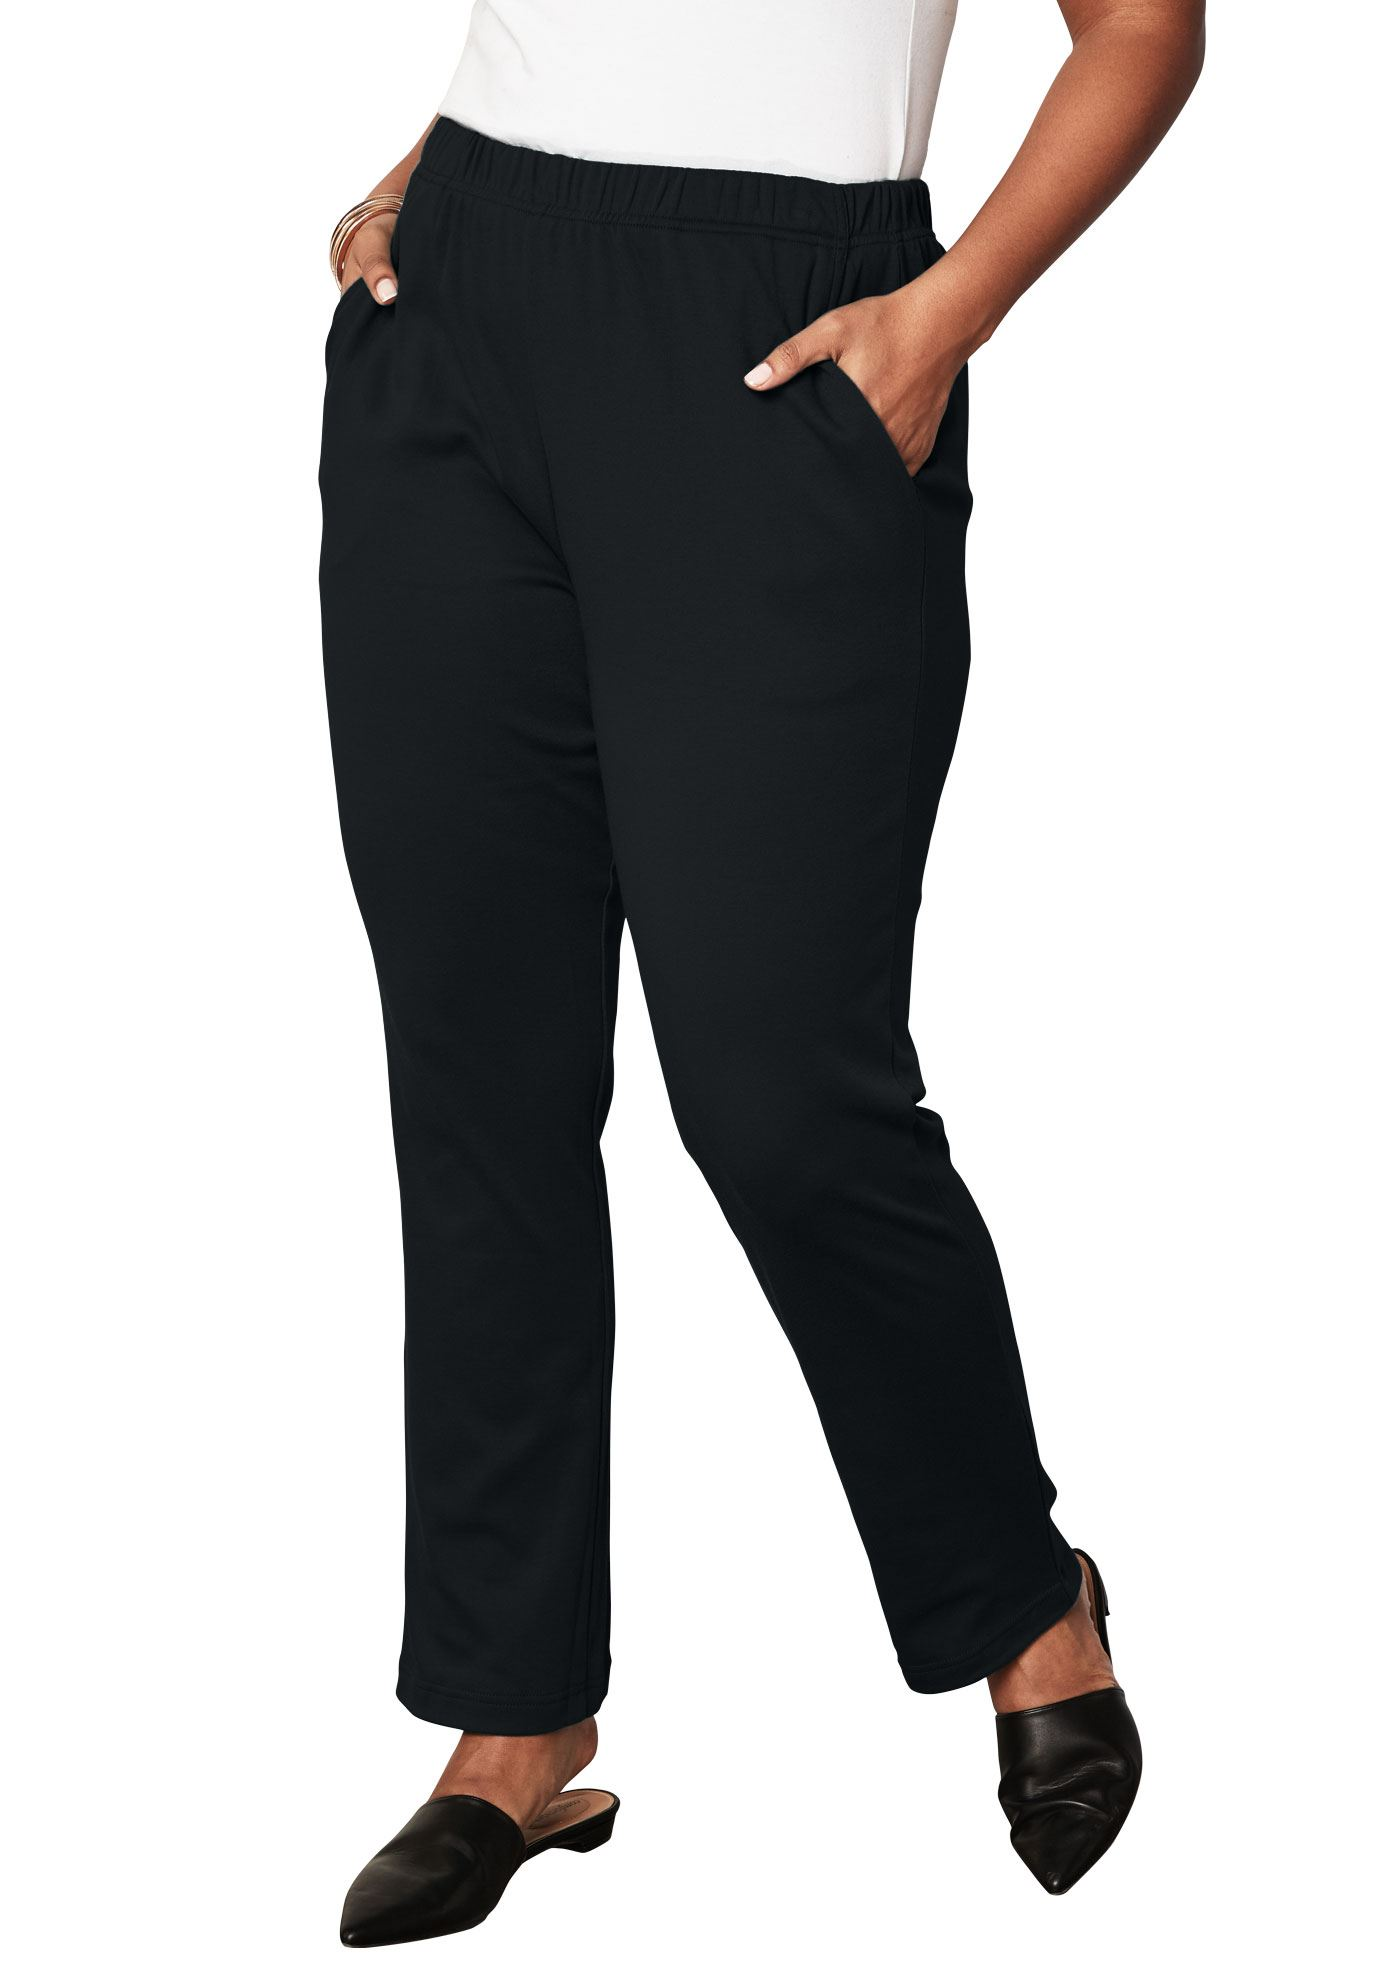 Roaman's Plus Size Petite Soft Knit Straight-leg Pants